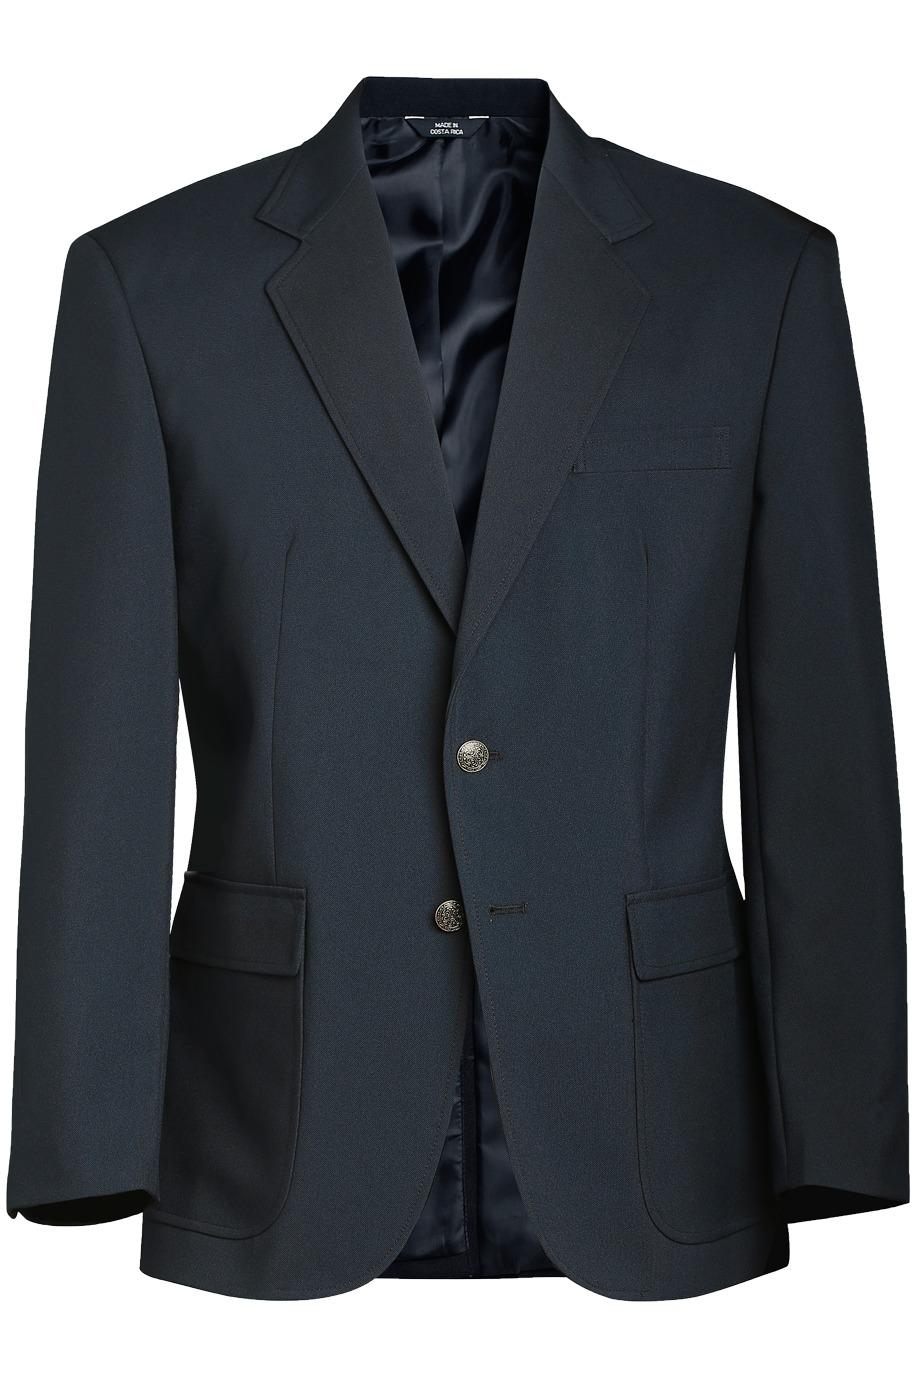 Aliexpress.com: Comprar Plus Size Formal Uniform Design